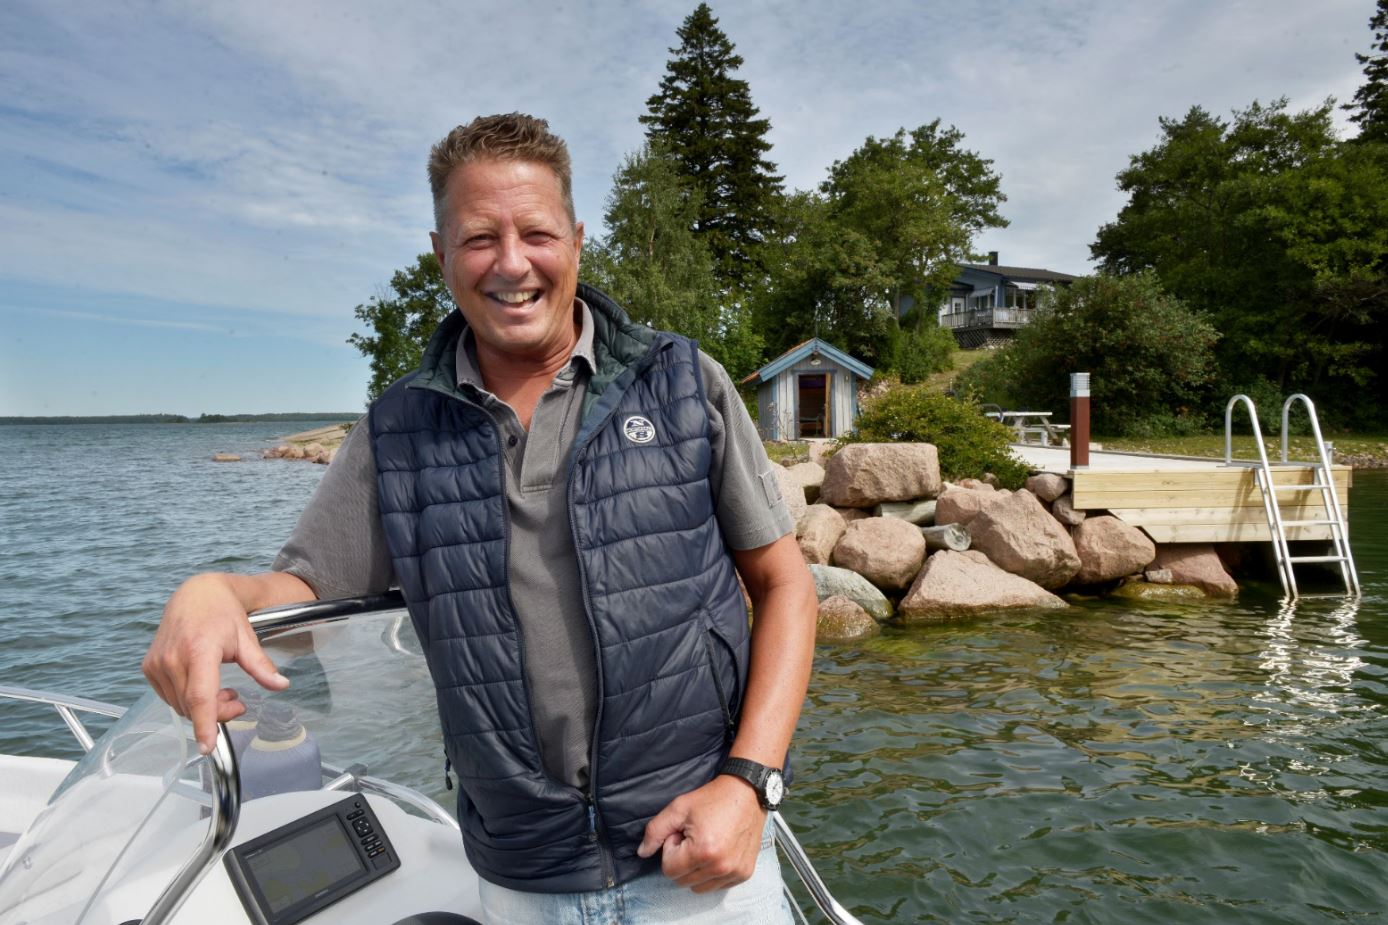 Foto: Erkki Santamala/Nya Åland